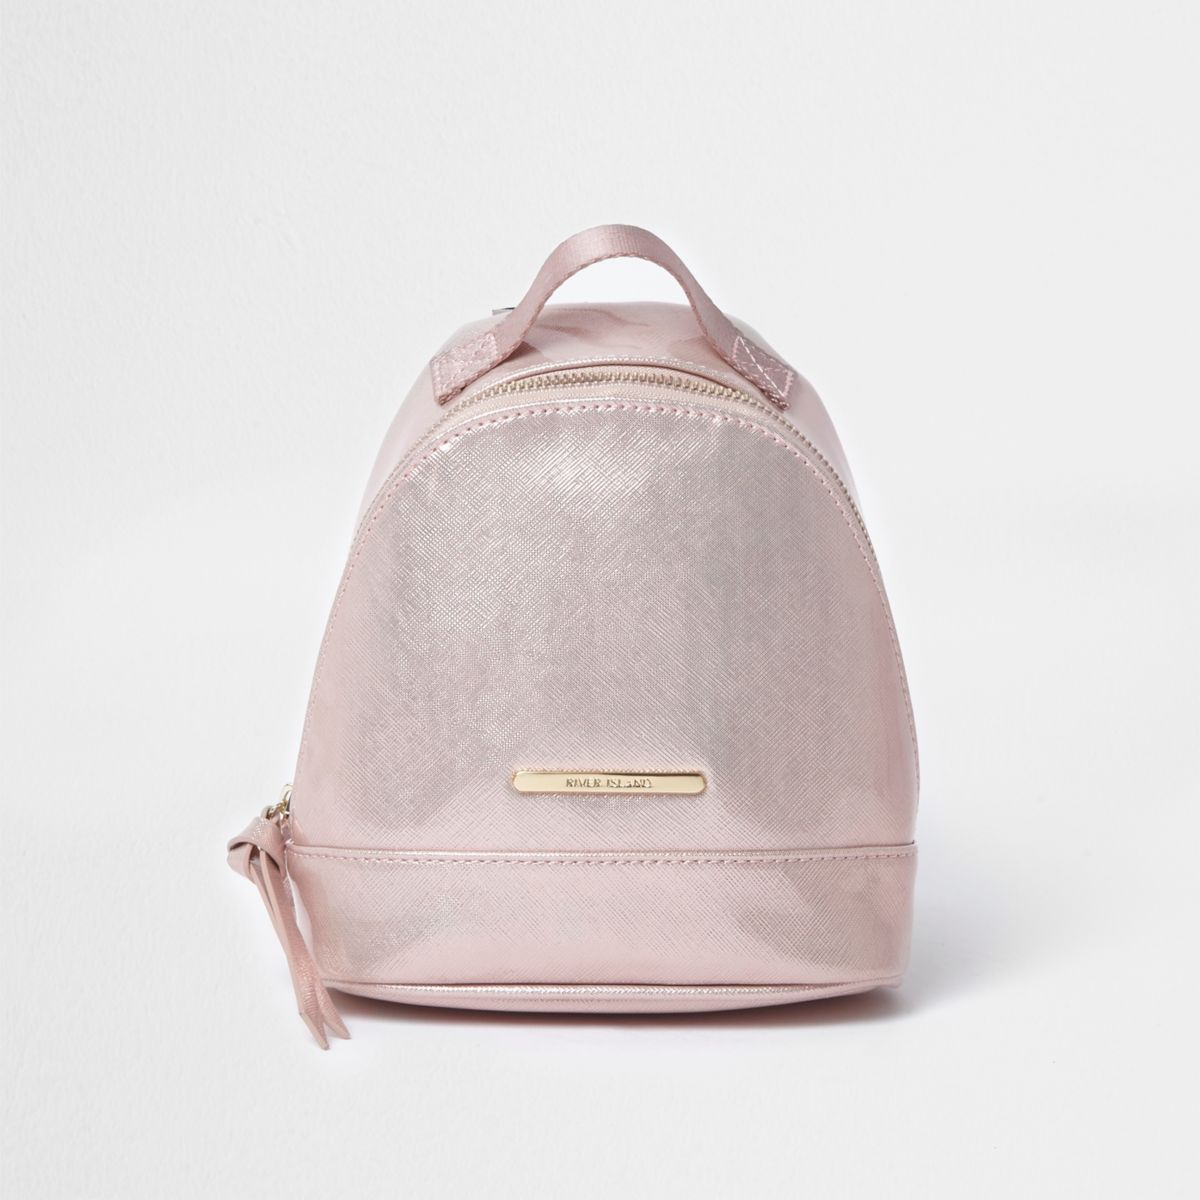 Petit sac à dos rose verni pour fille